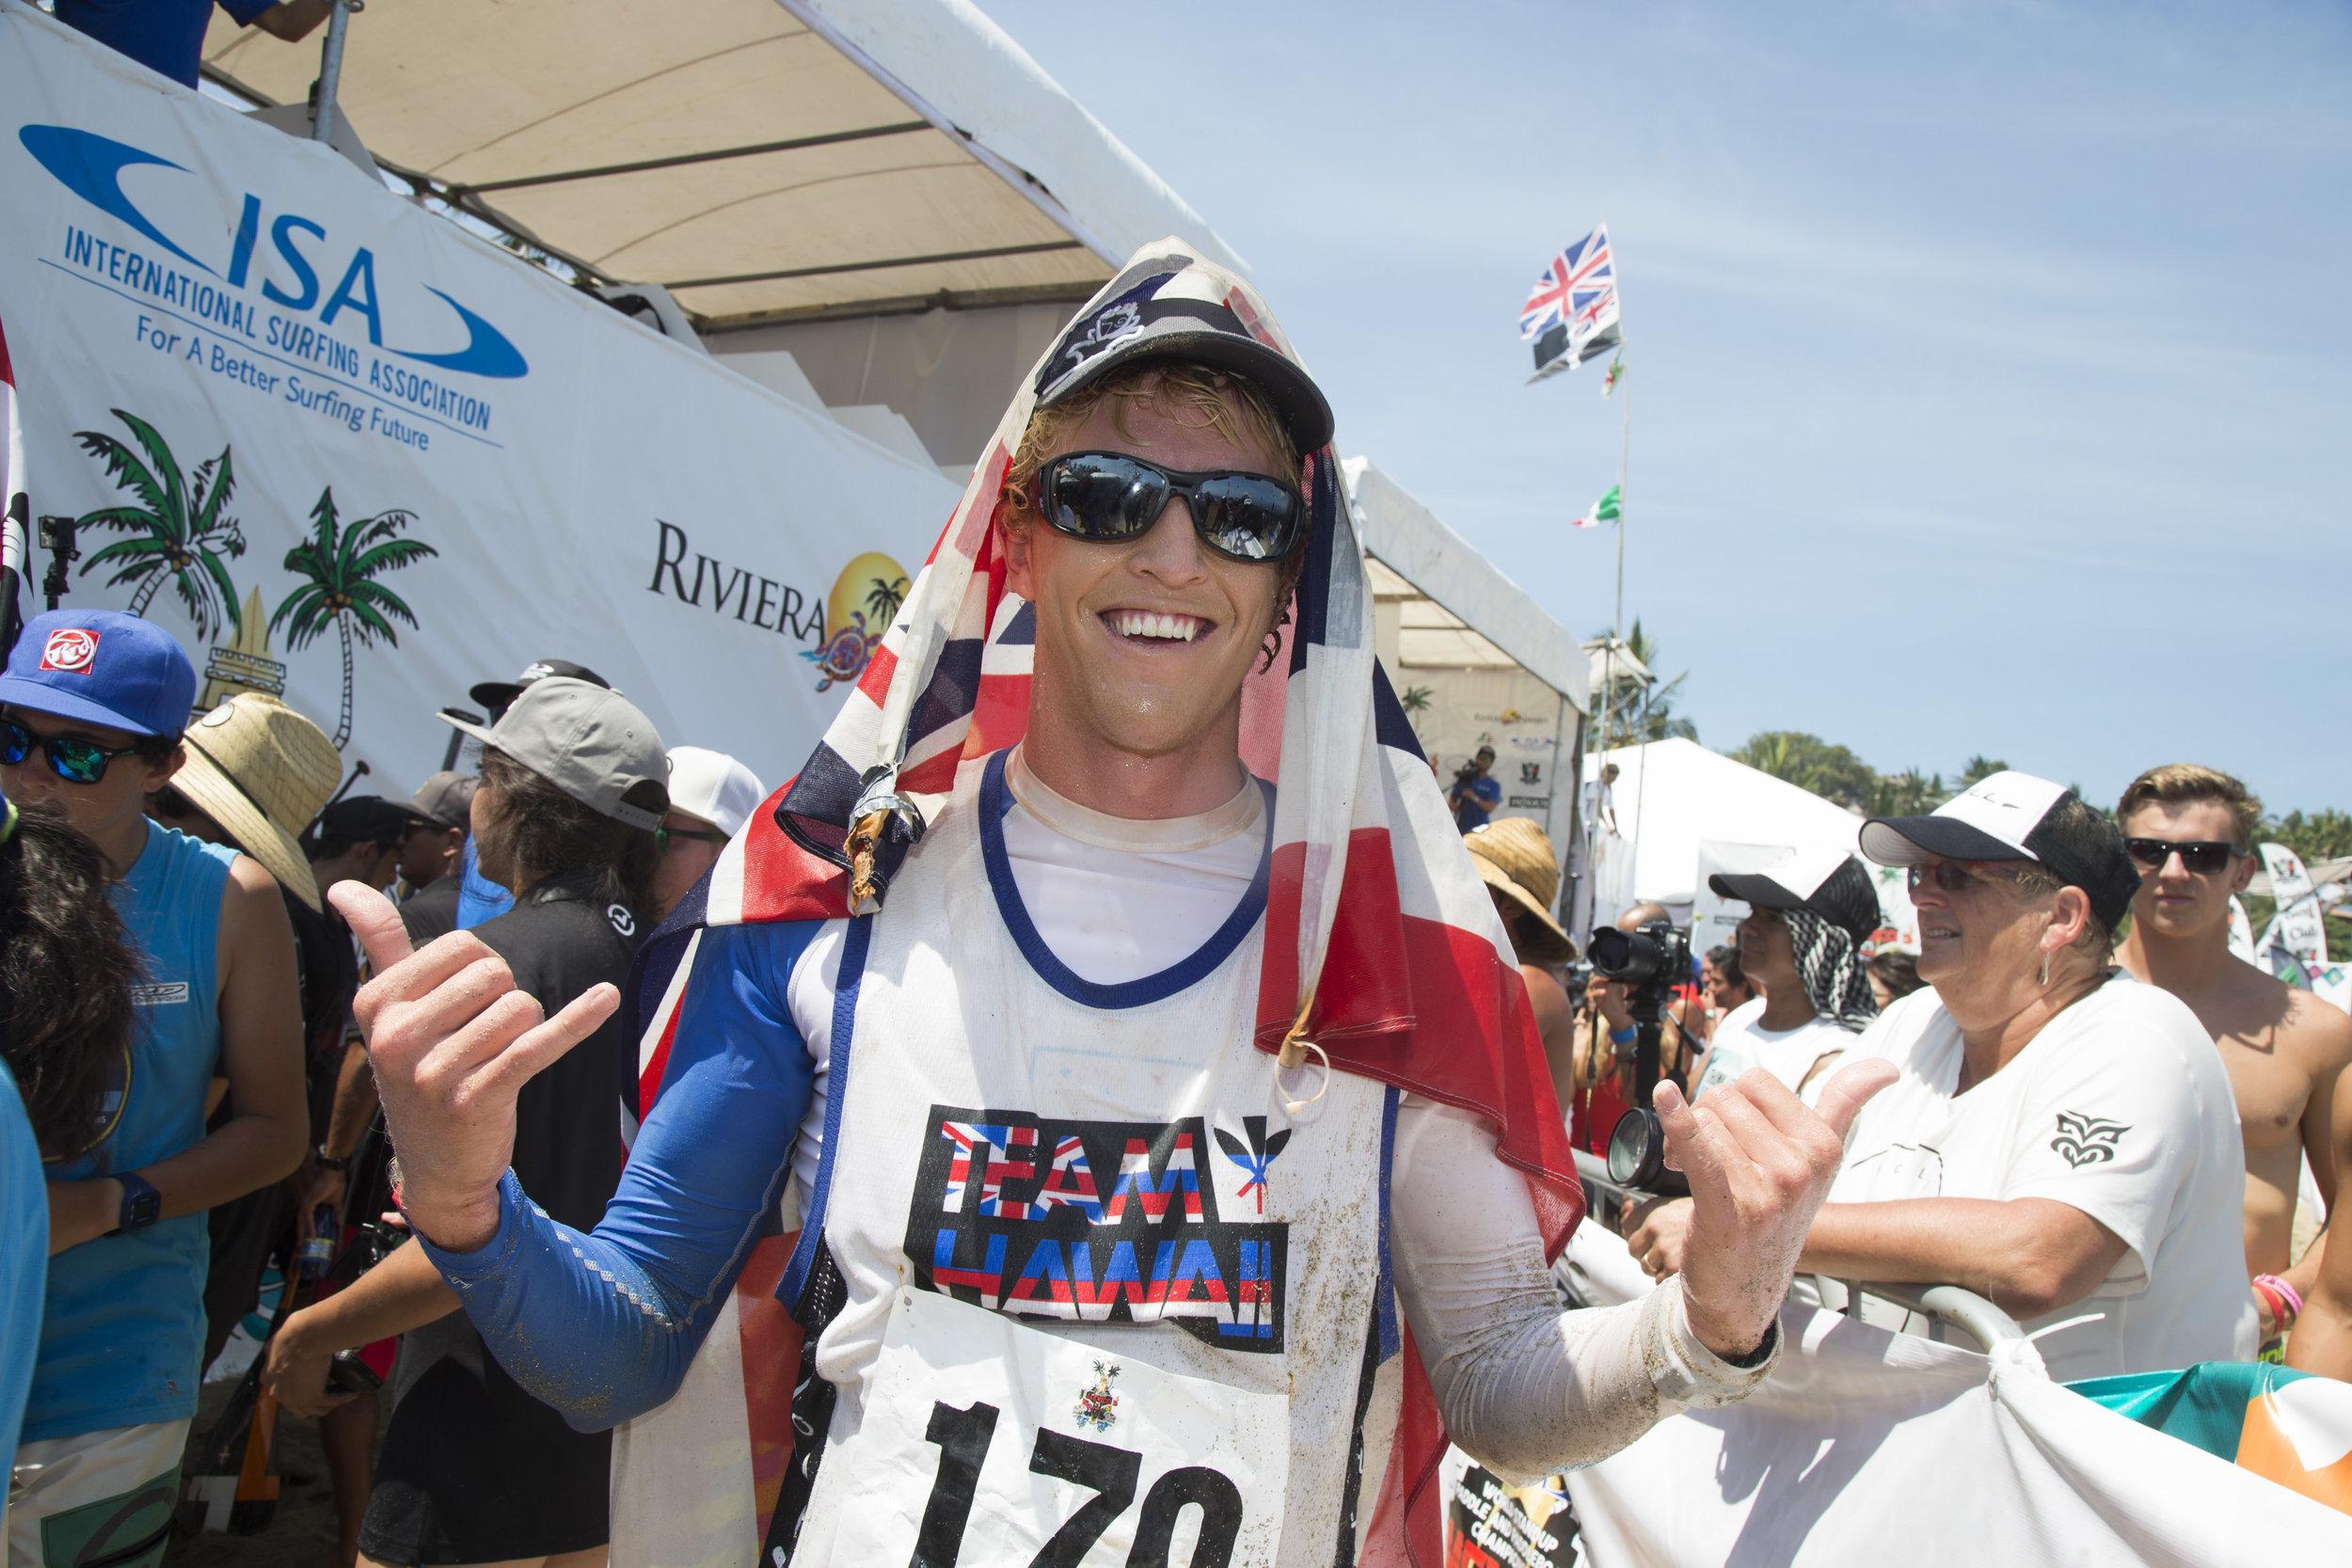 Connor Baxter - HawaiiSUP Technical Race and Distance Race